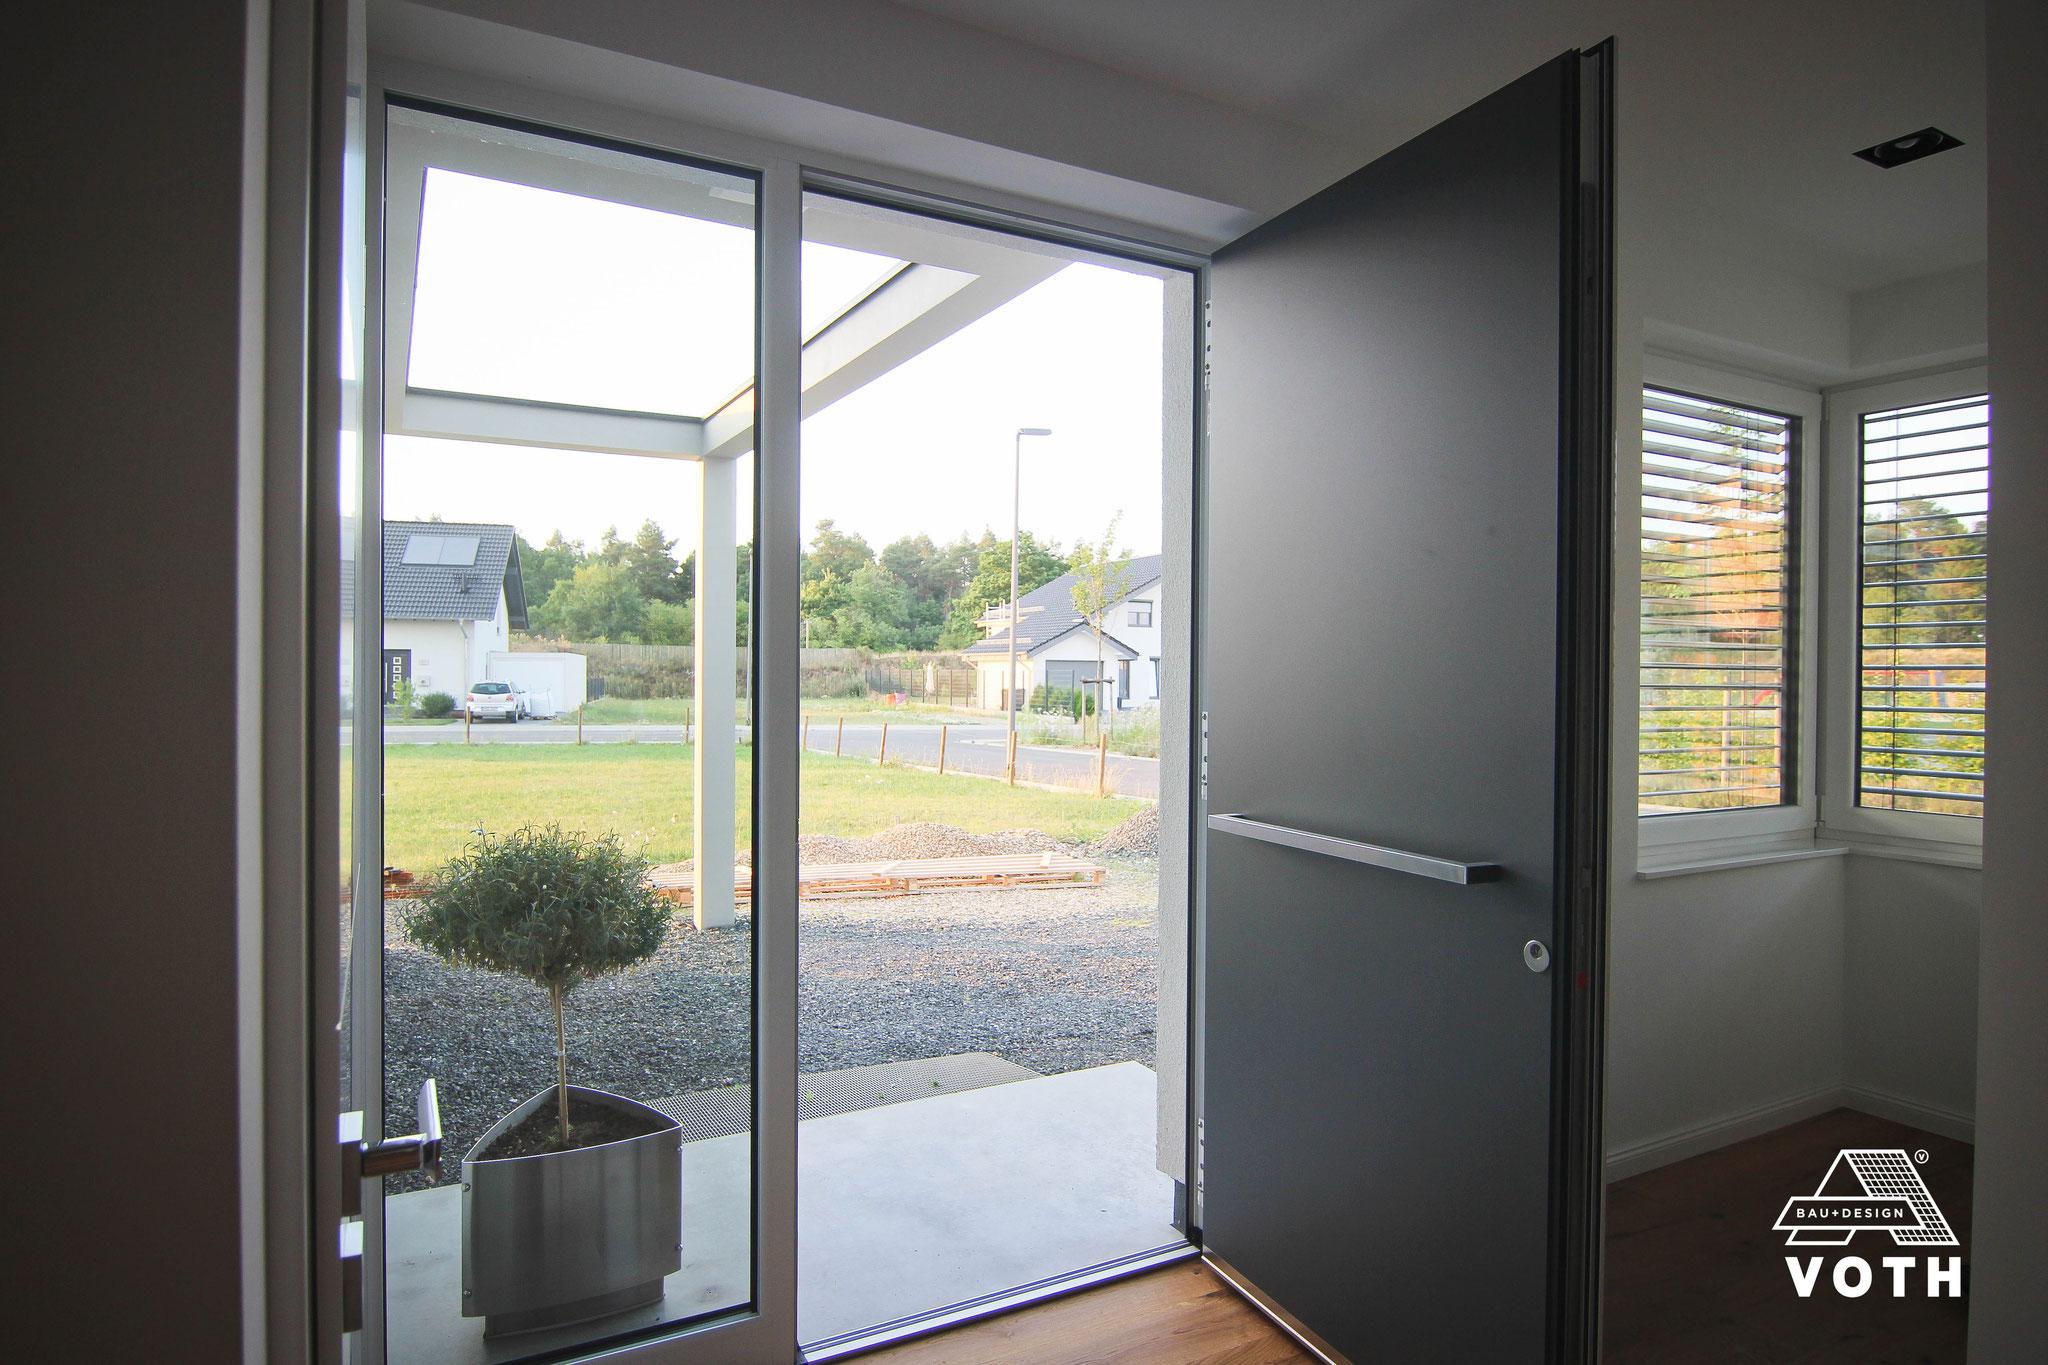 Aluminium Haustüren in Mönchengladbach kaufen